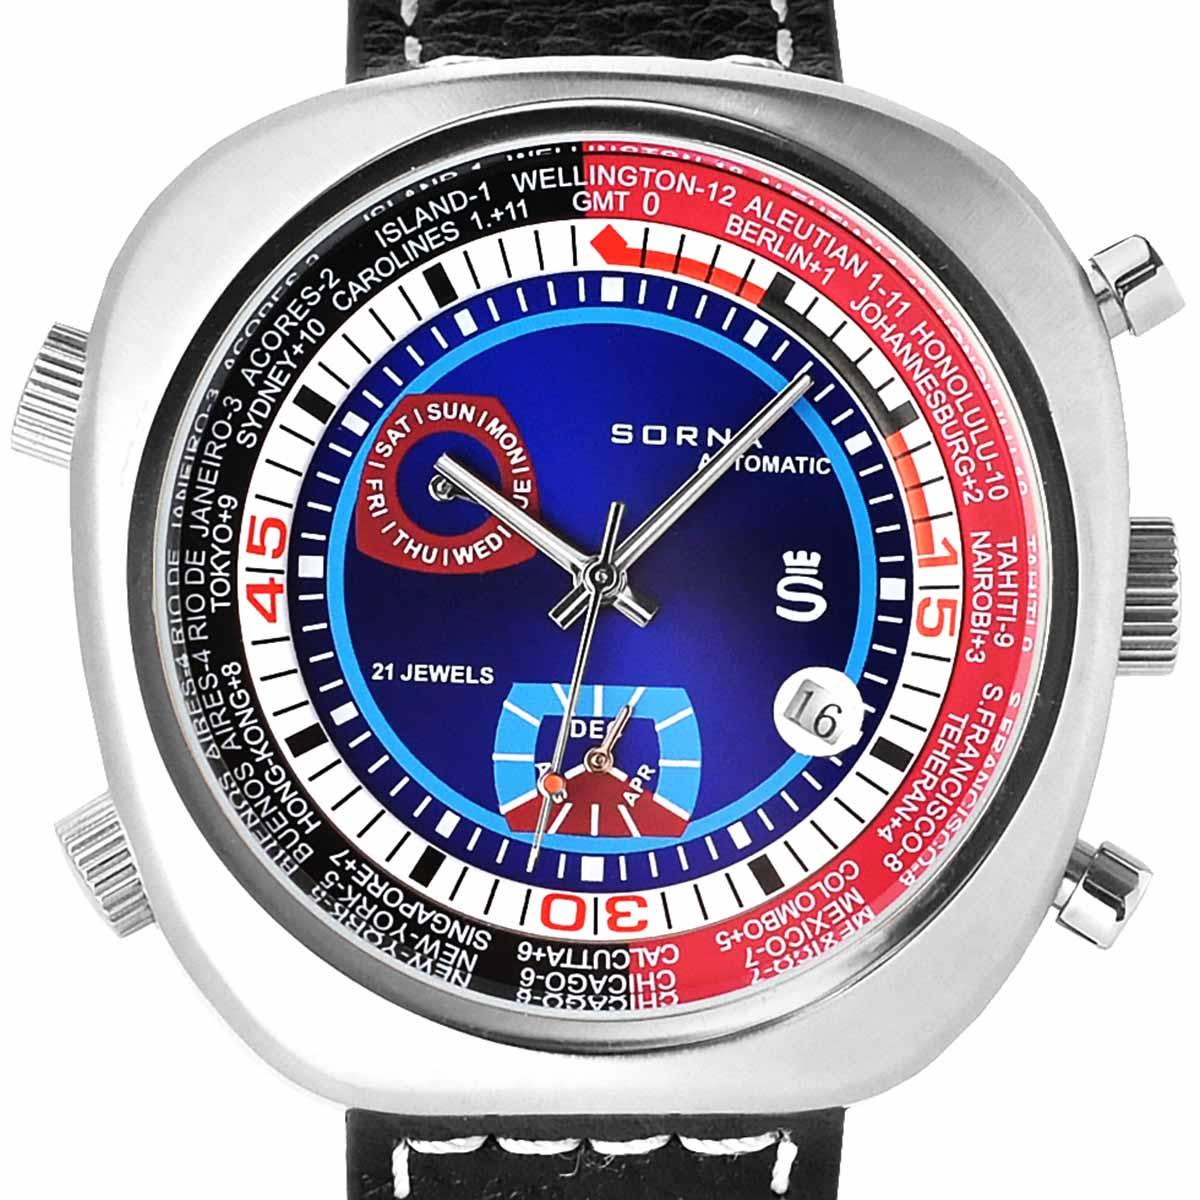 SORNA ソルナ 自動巻き(手巻き機能あり) 腕時計 [T23766-BLUE] 並行輸入品 カレンダー GMT(ワールドタイム)